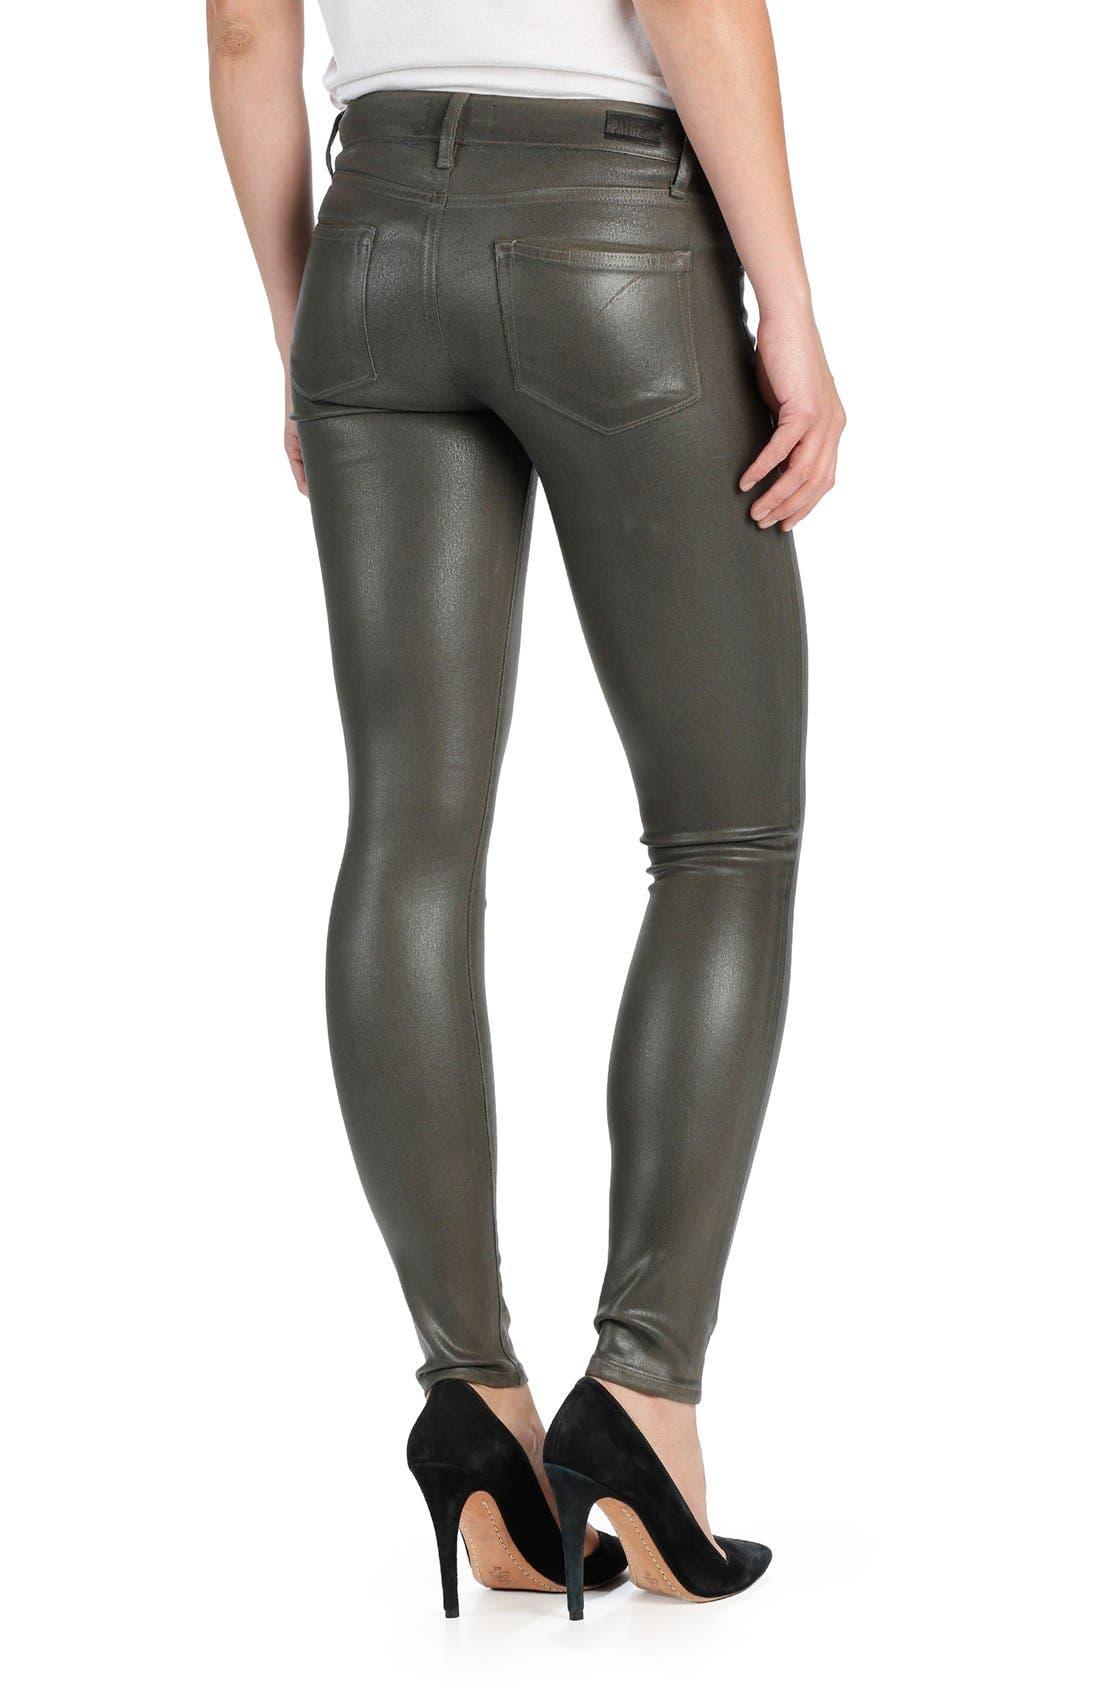 Transcend Verdugo Coated Ultra Skinny Jeans,                             Alternate thumbnail 2, color,                             300